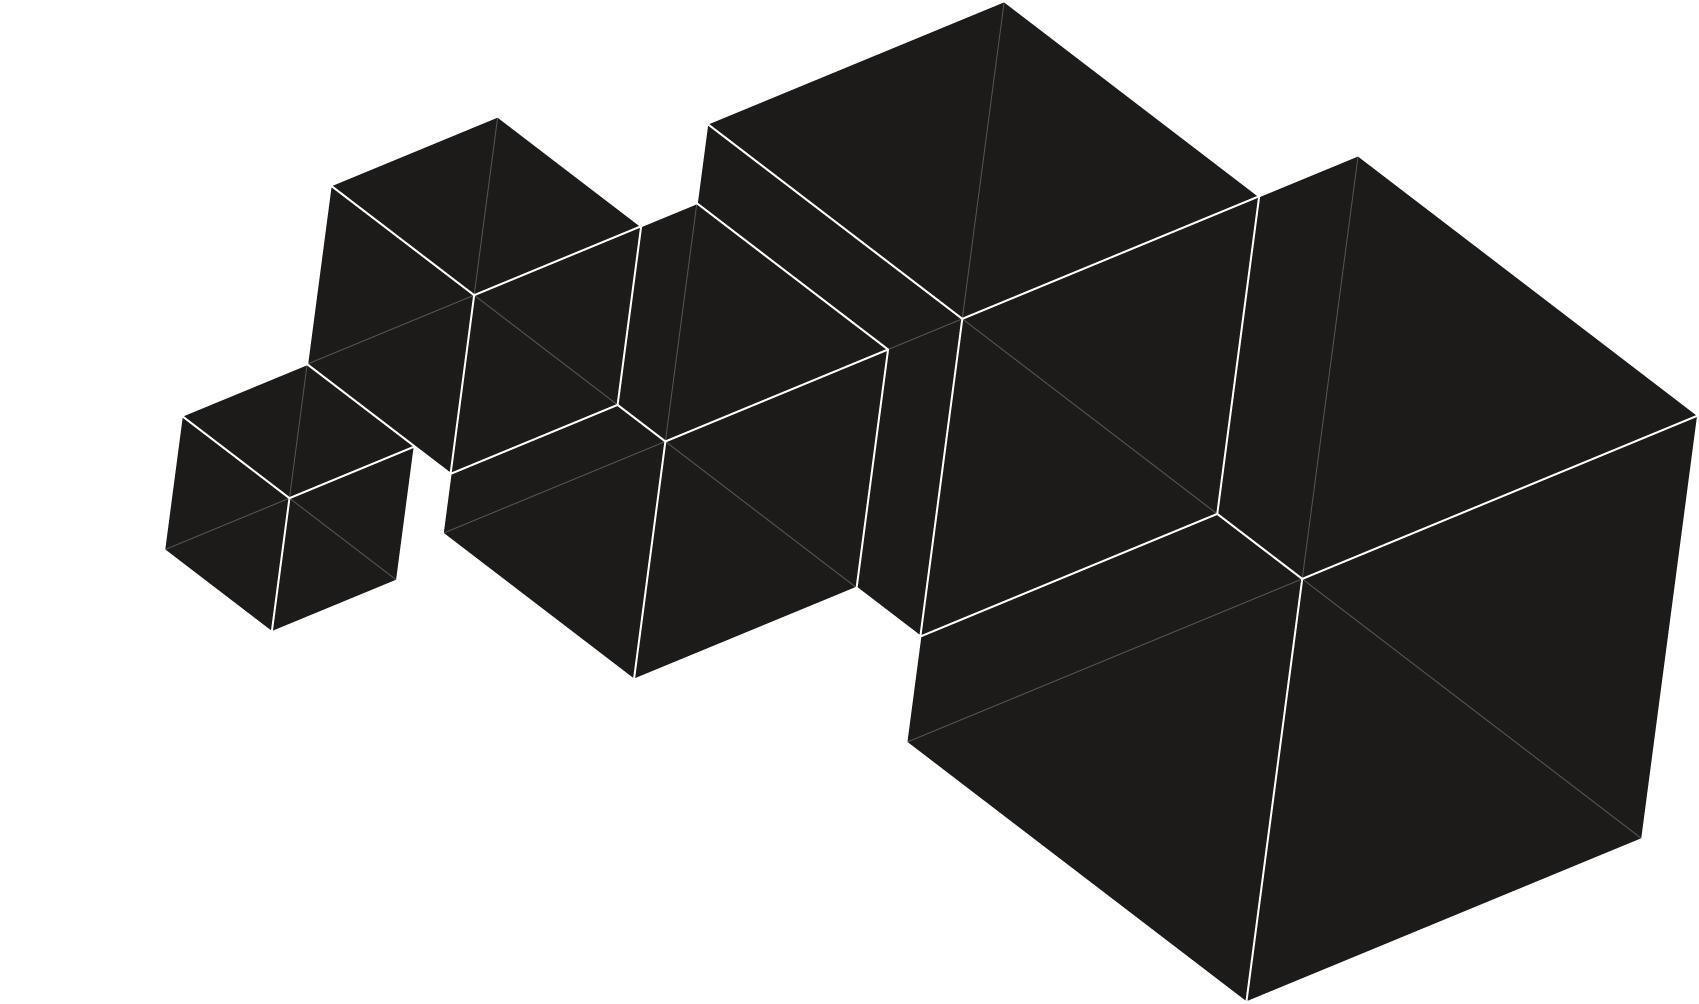 HEXAGONS_05.jpg